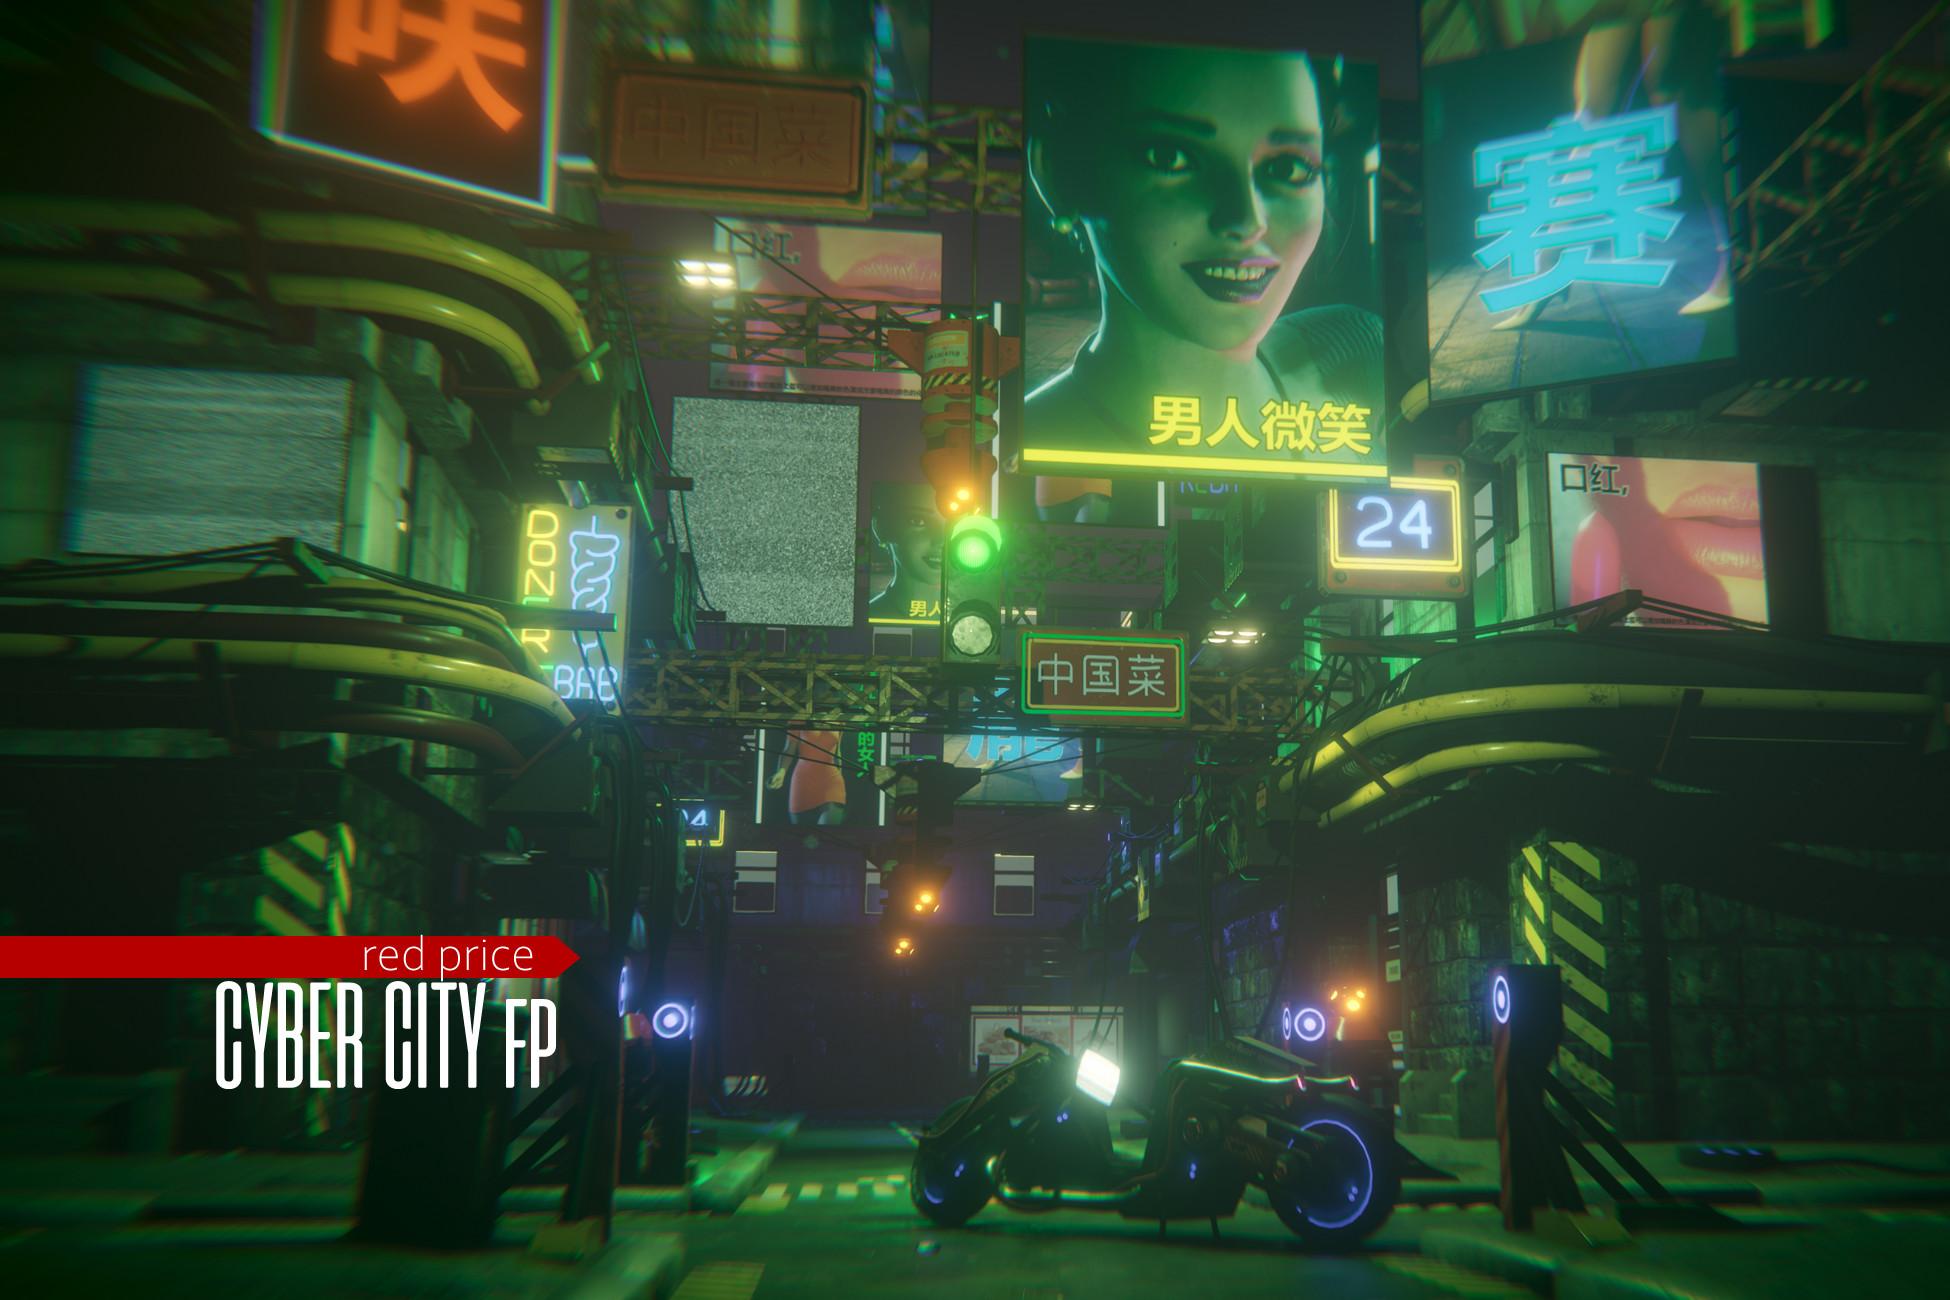 cyberpunk - Cyber City Fp